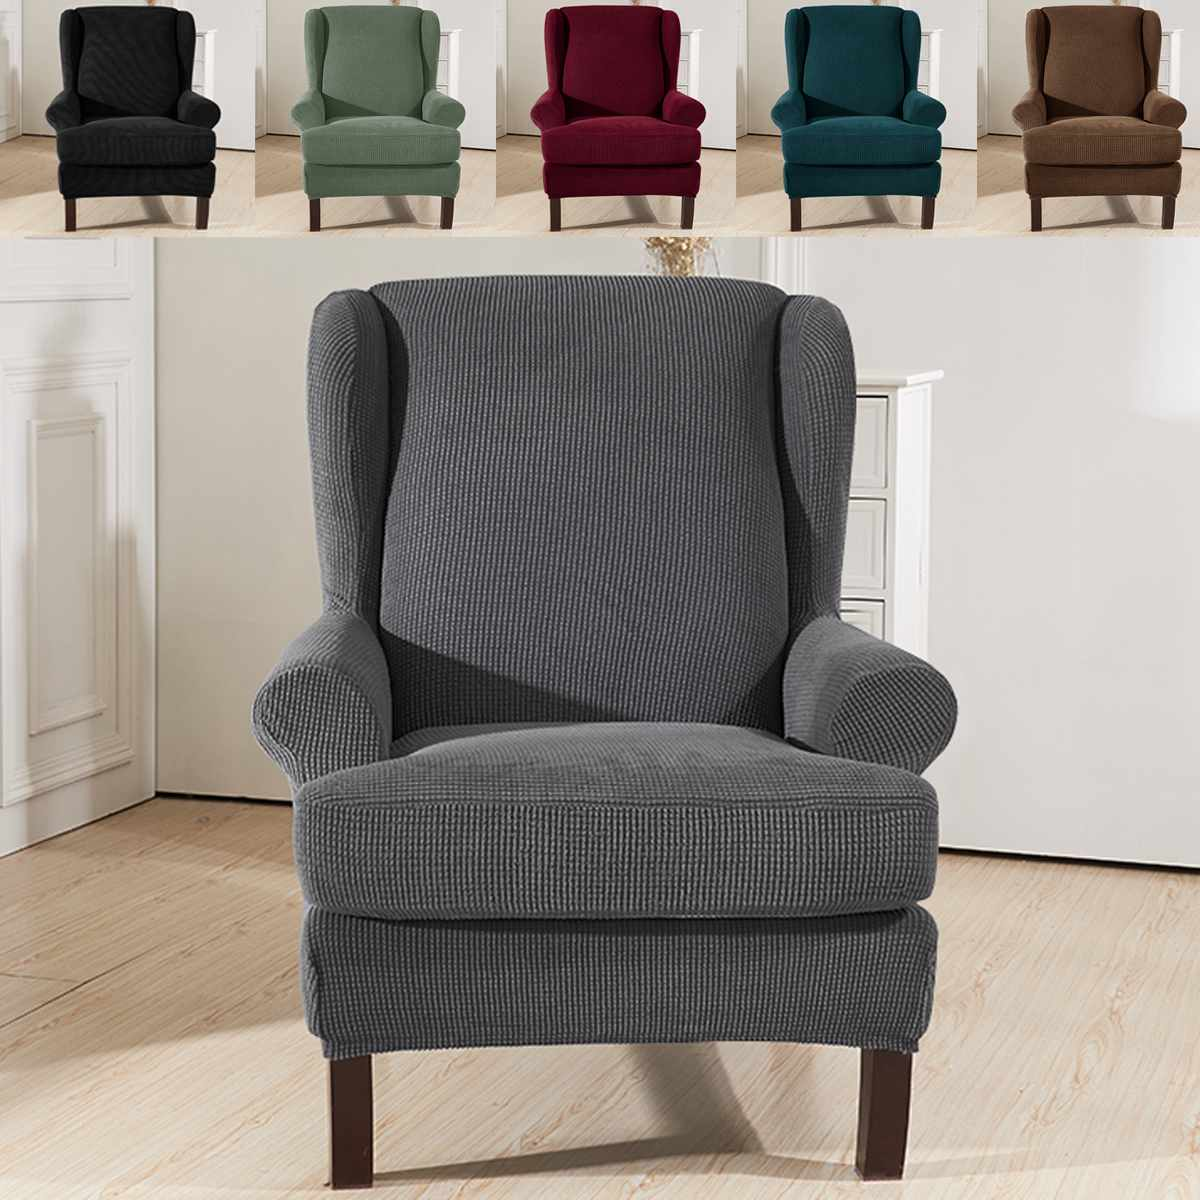 Elastic Armchair Wingback Wing Sofa Back Chair Cover Sloping Arm King Back Chair Cover Stretch Protector Slipcover Protector Slipcovers Dining Room